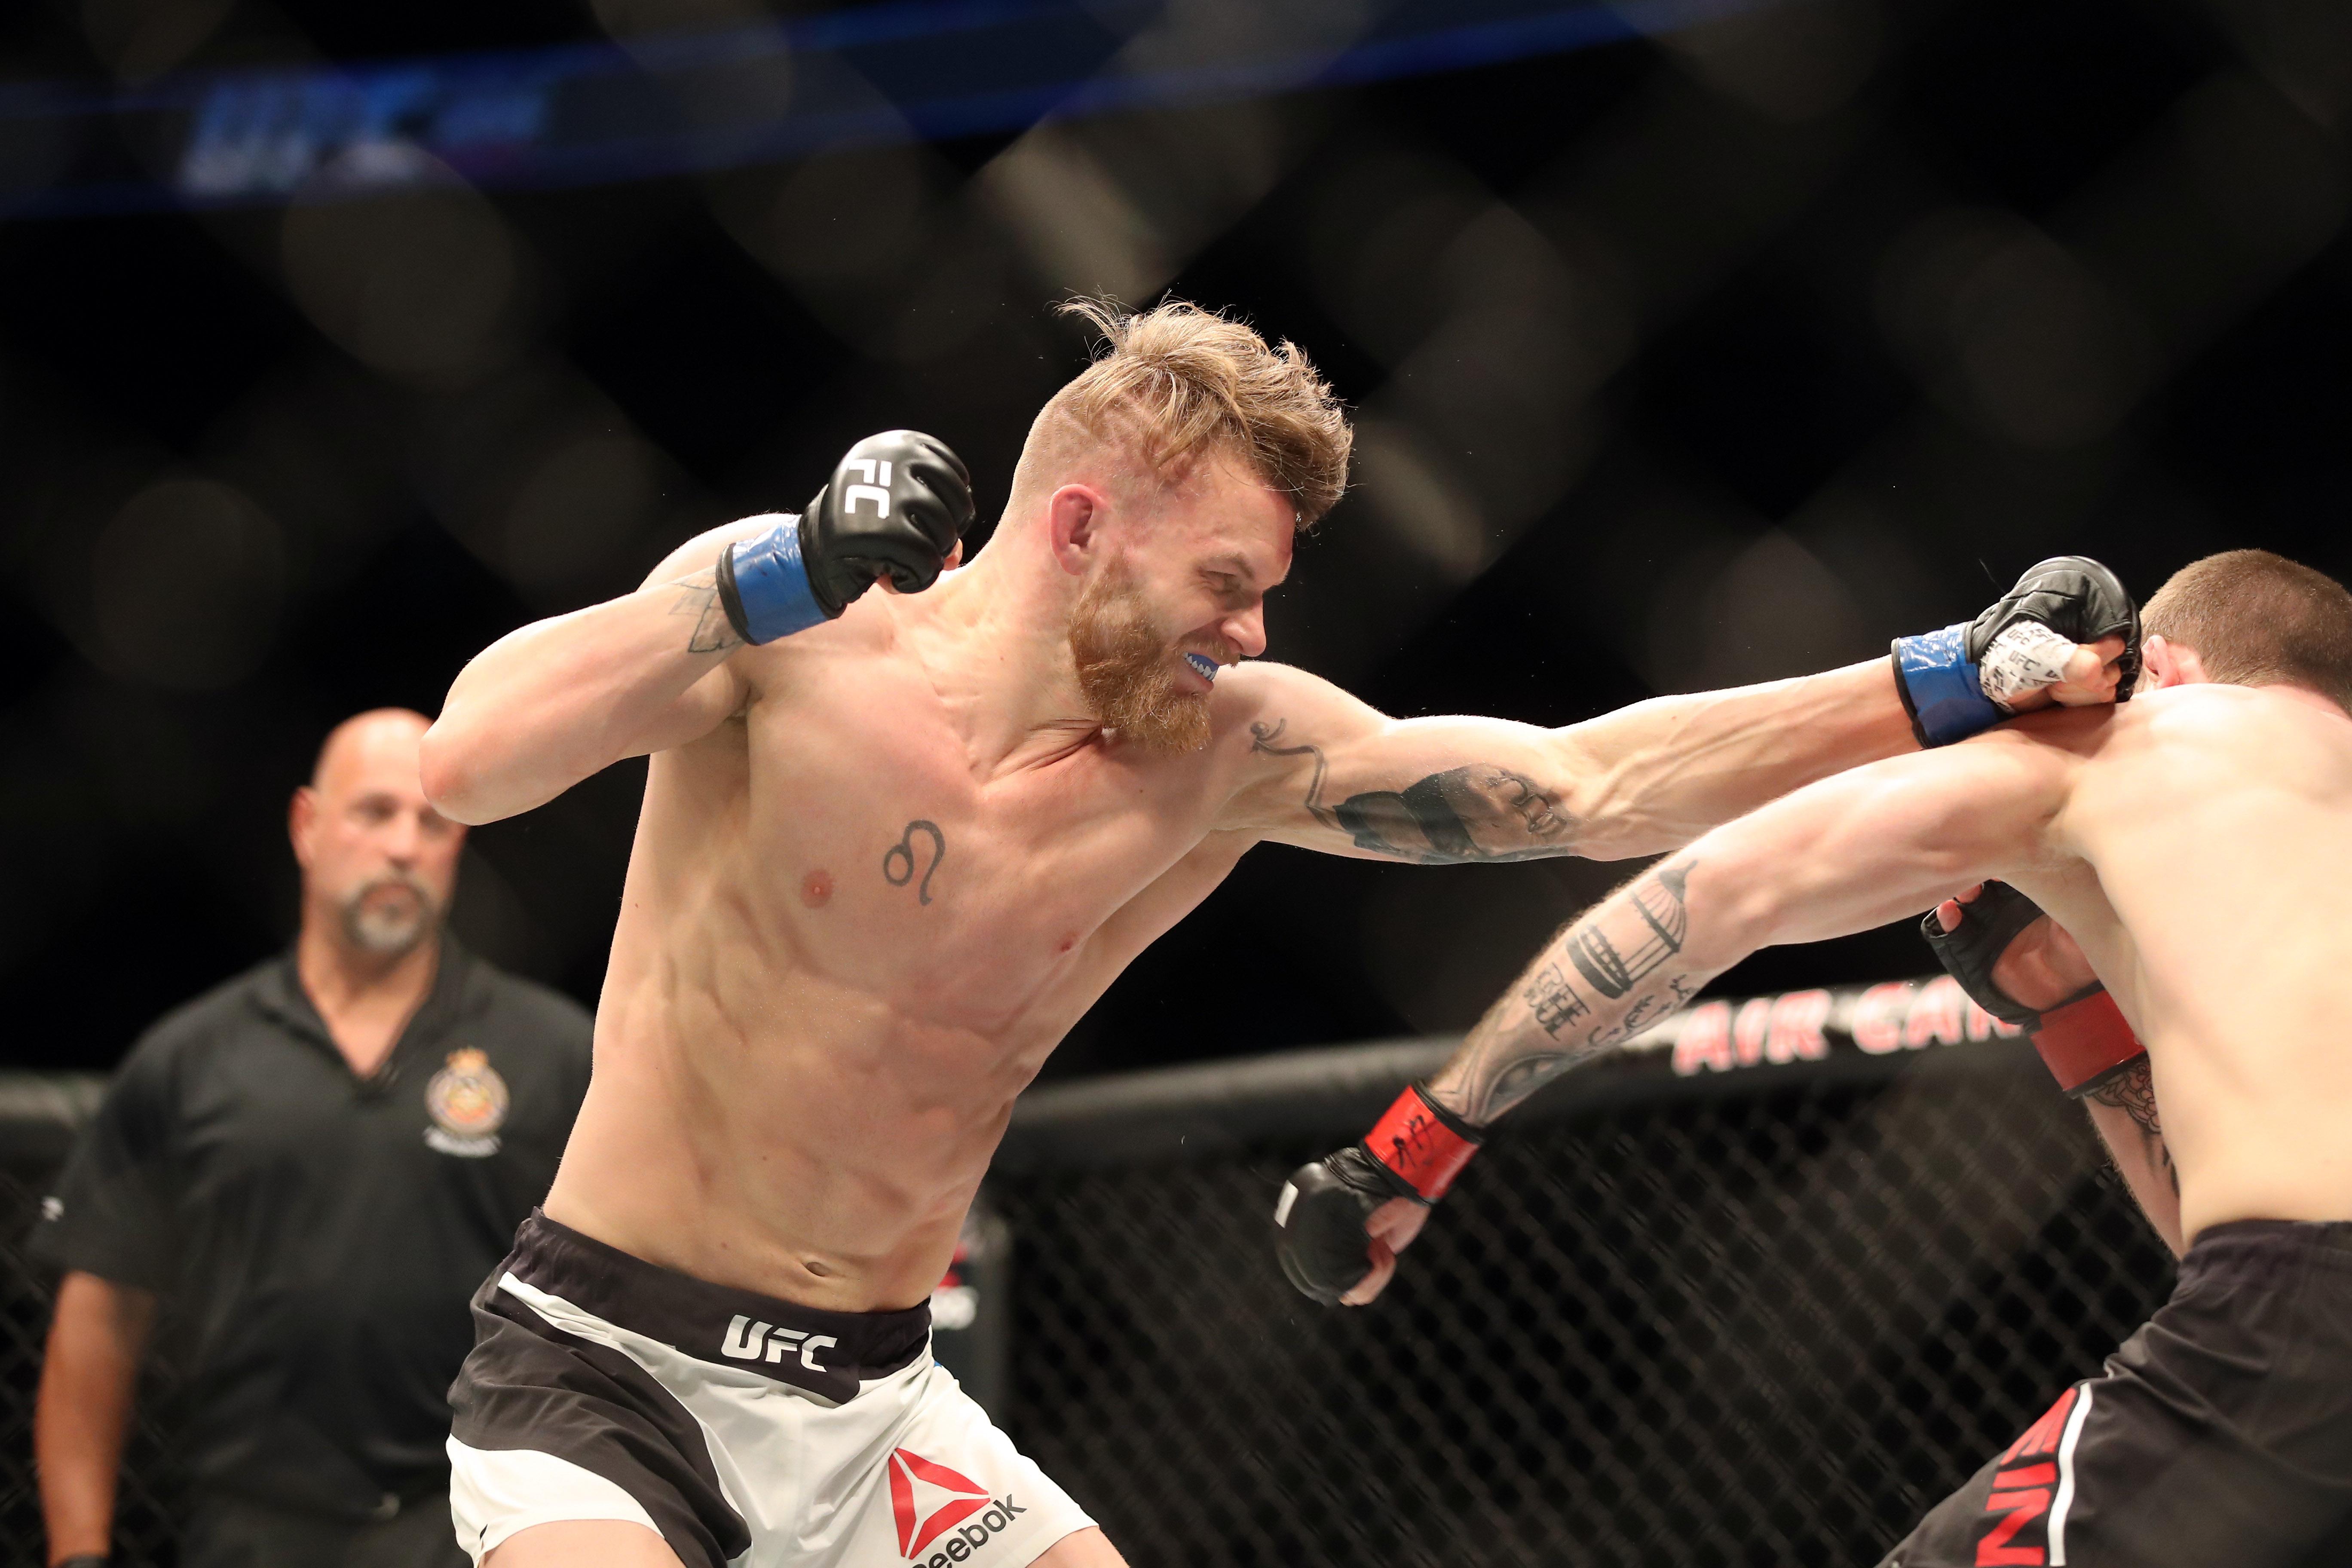 MMA: UFC 206- Krylov vs Cirkunov